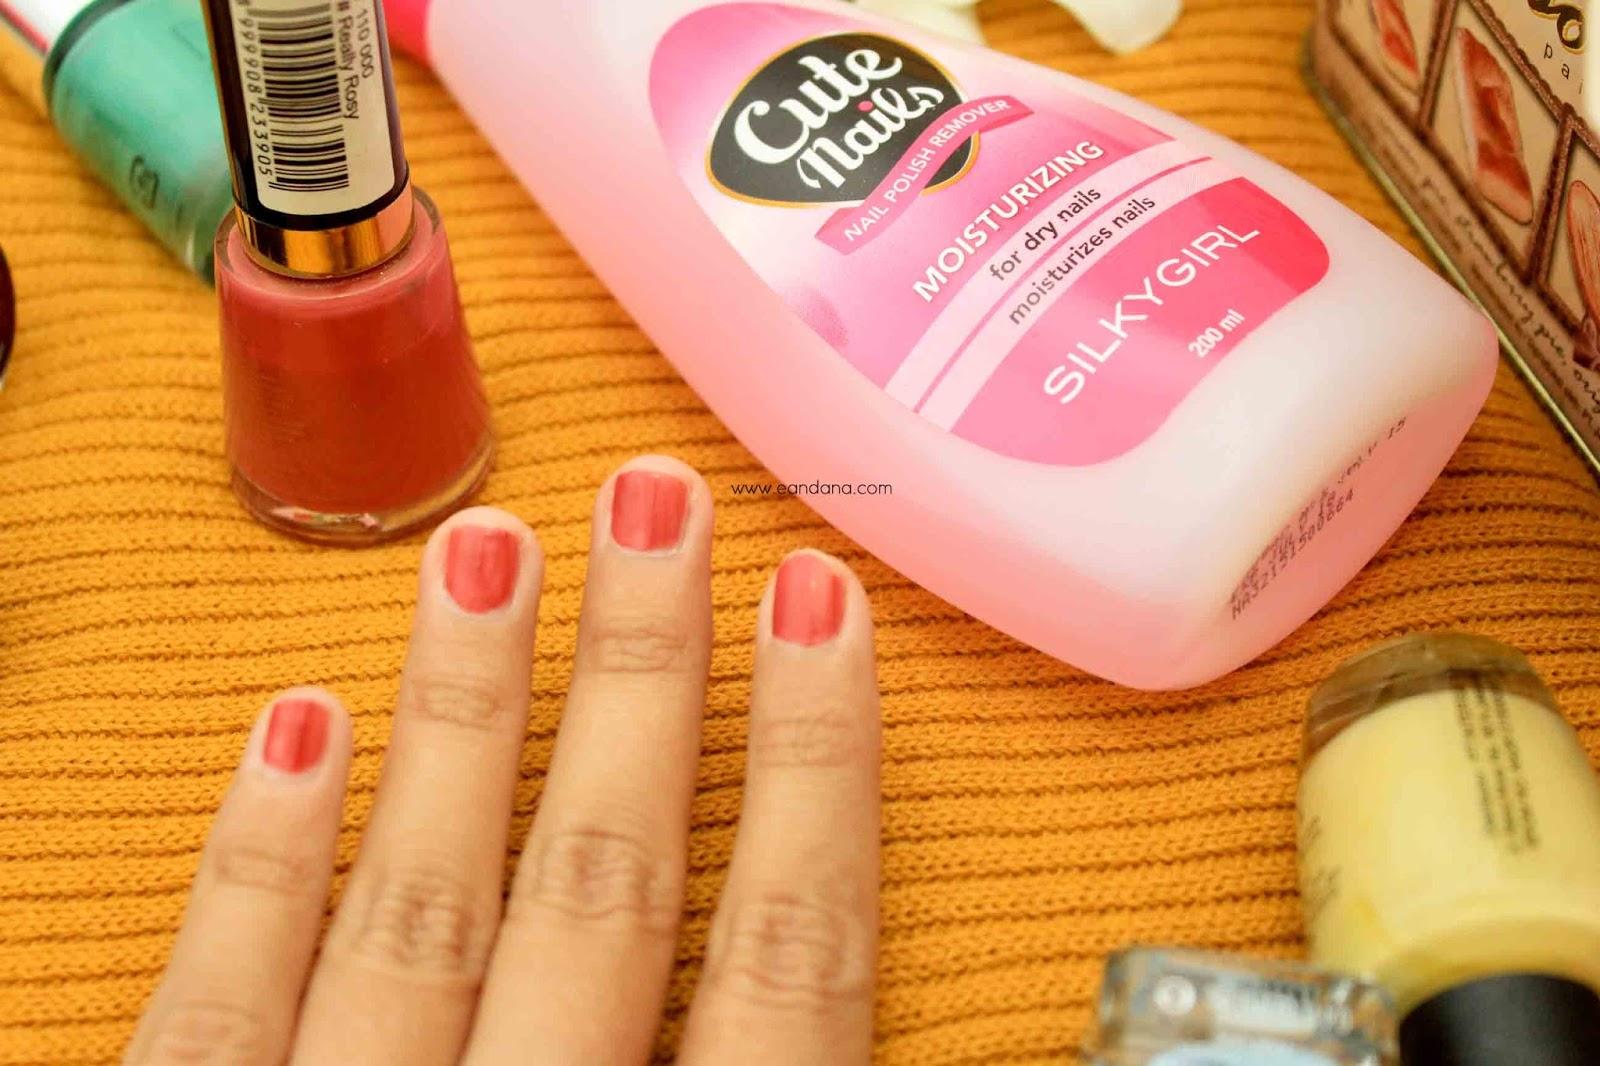 silky girl cute nail polish remover moisturizing dry nails